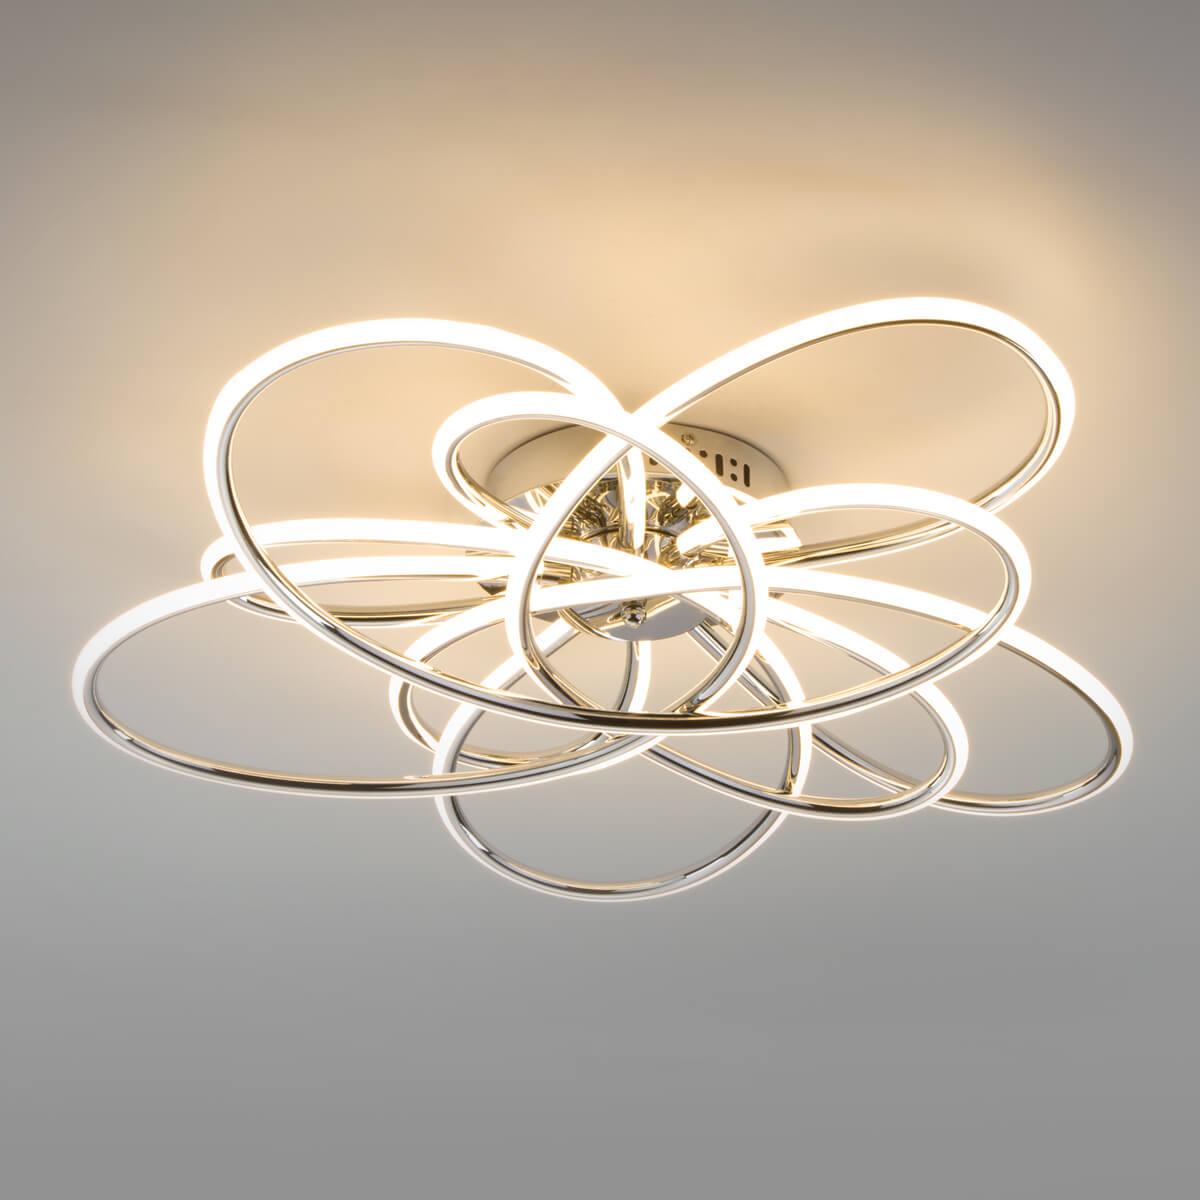 Светильник Eurosvet 90143/5 хром Spring